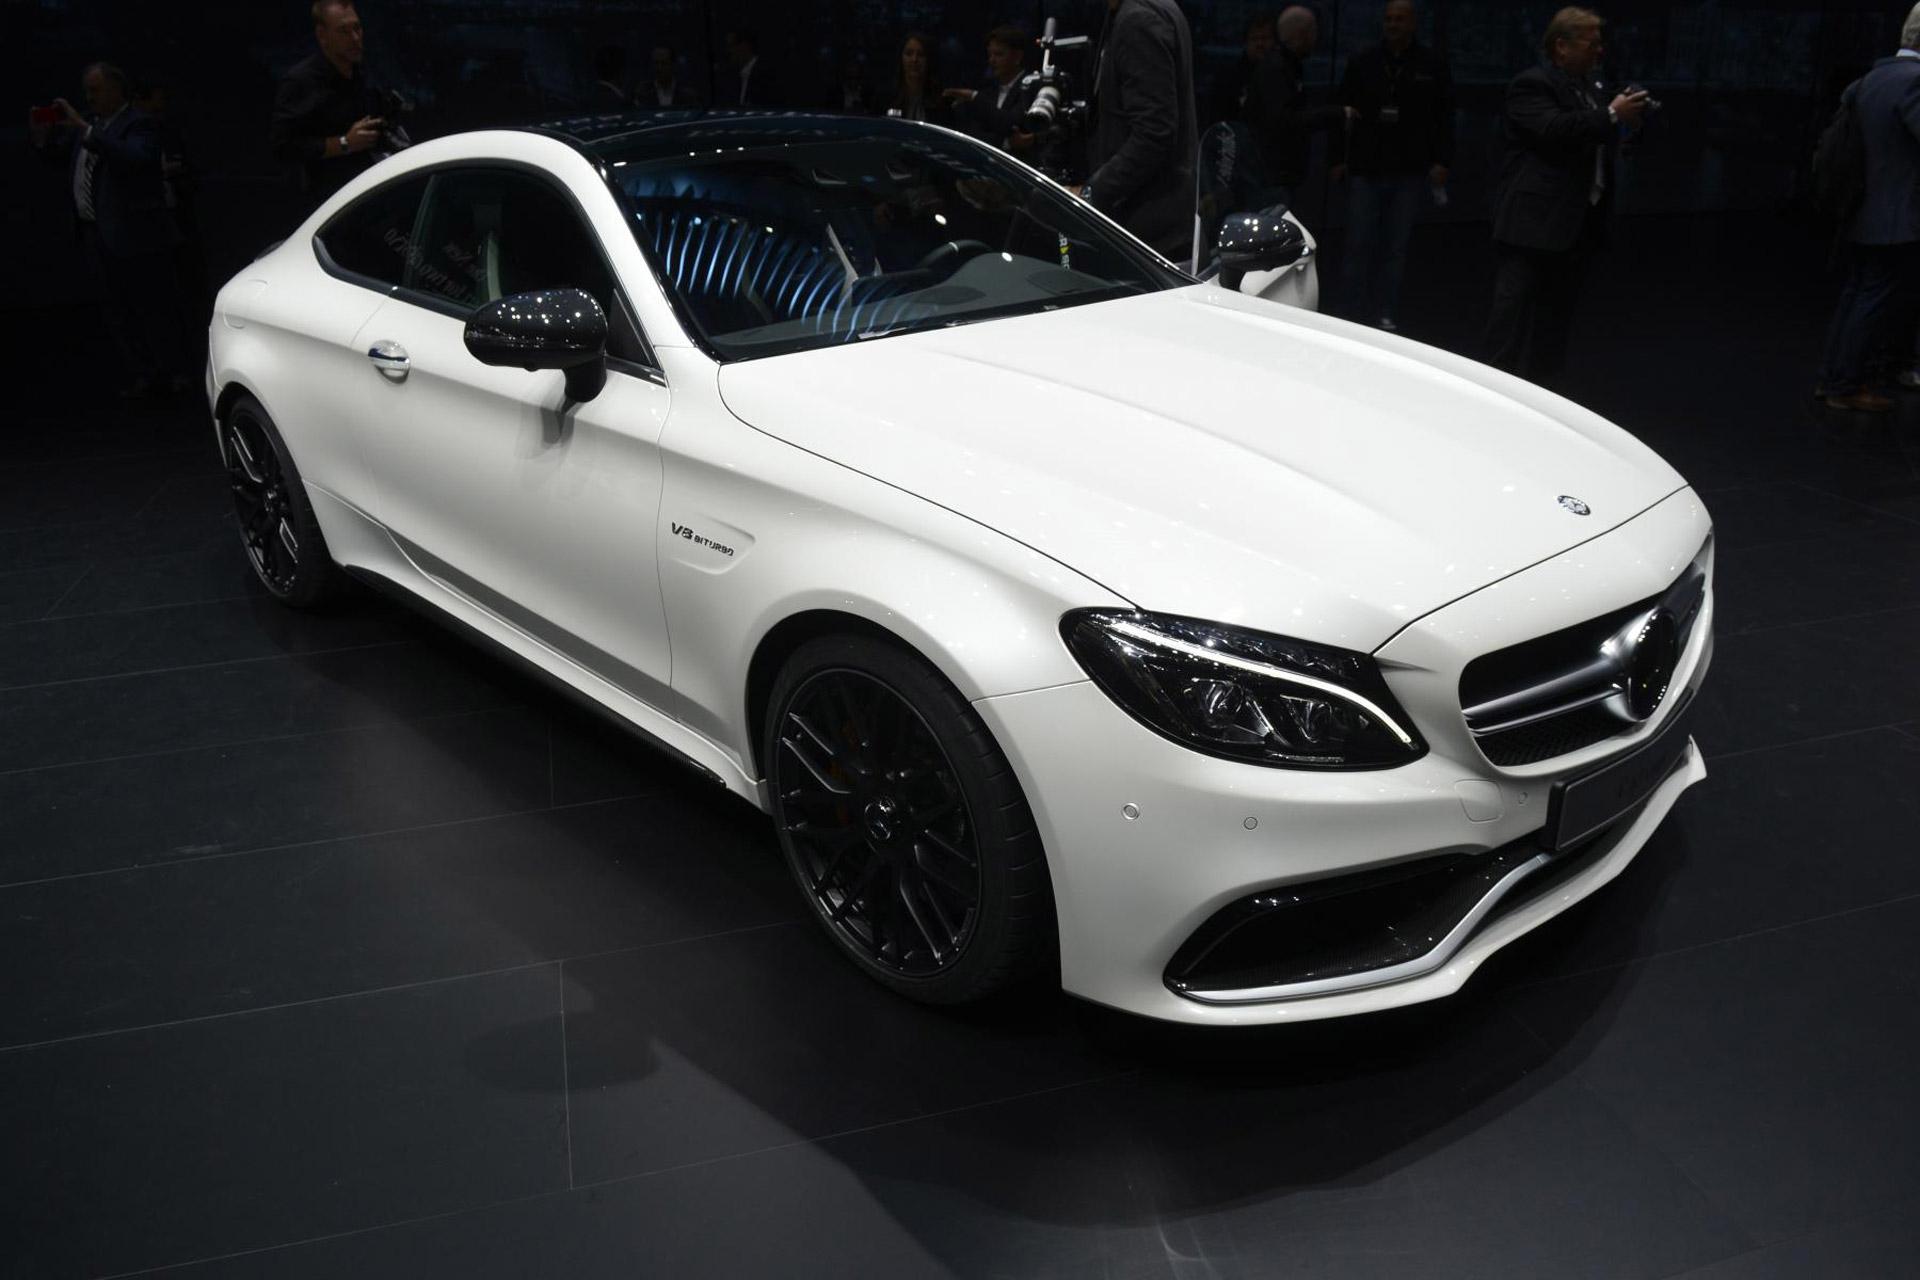 2017 Mercedes-AMG C63 Coupe: 2015 Frankfurt Auto Show Live Photos & Video